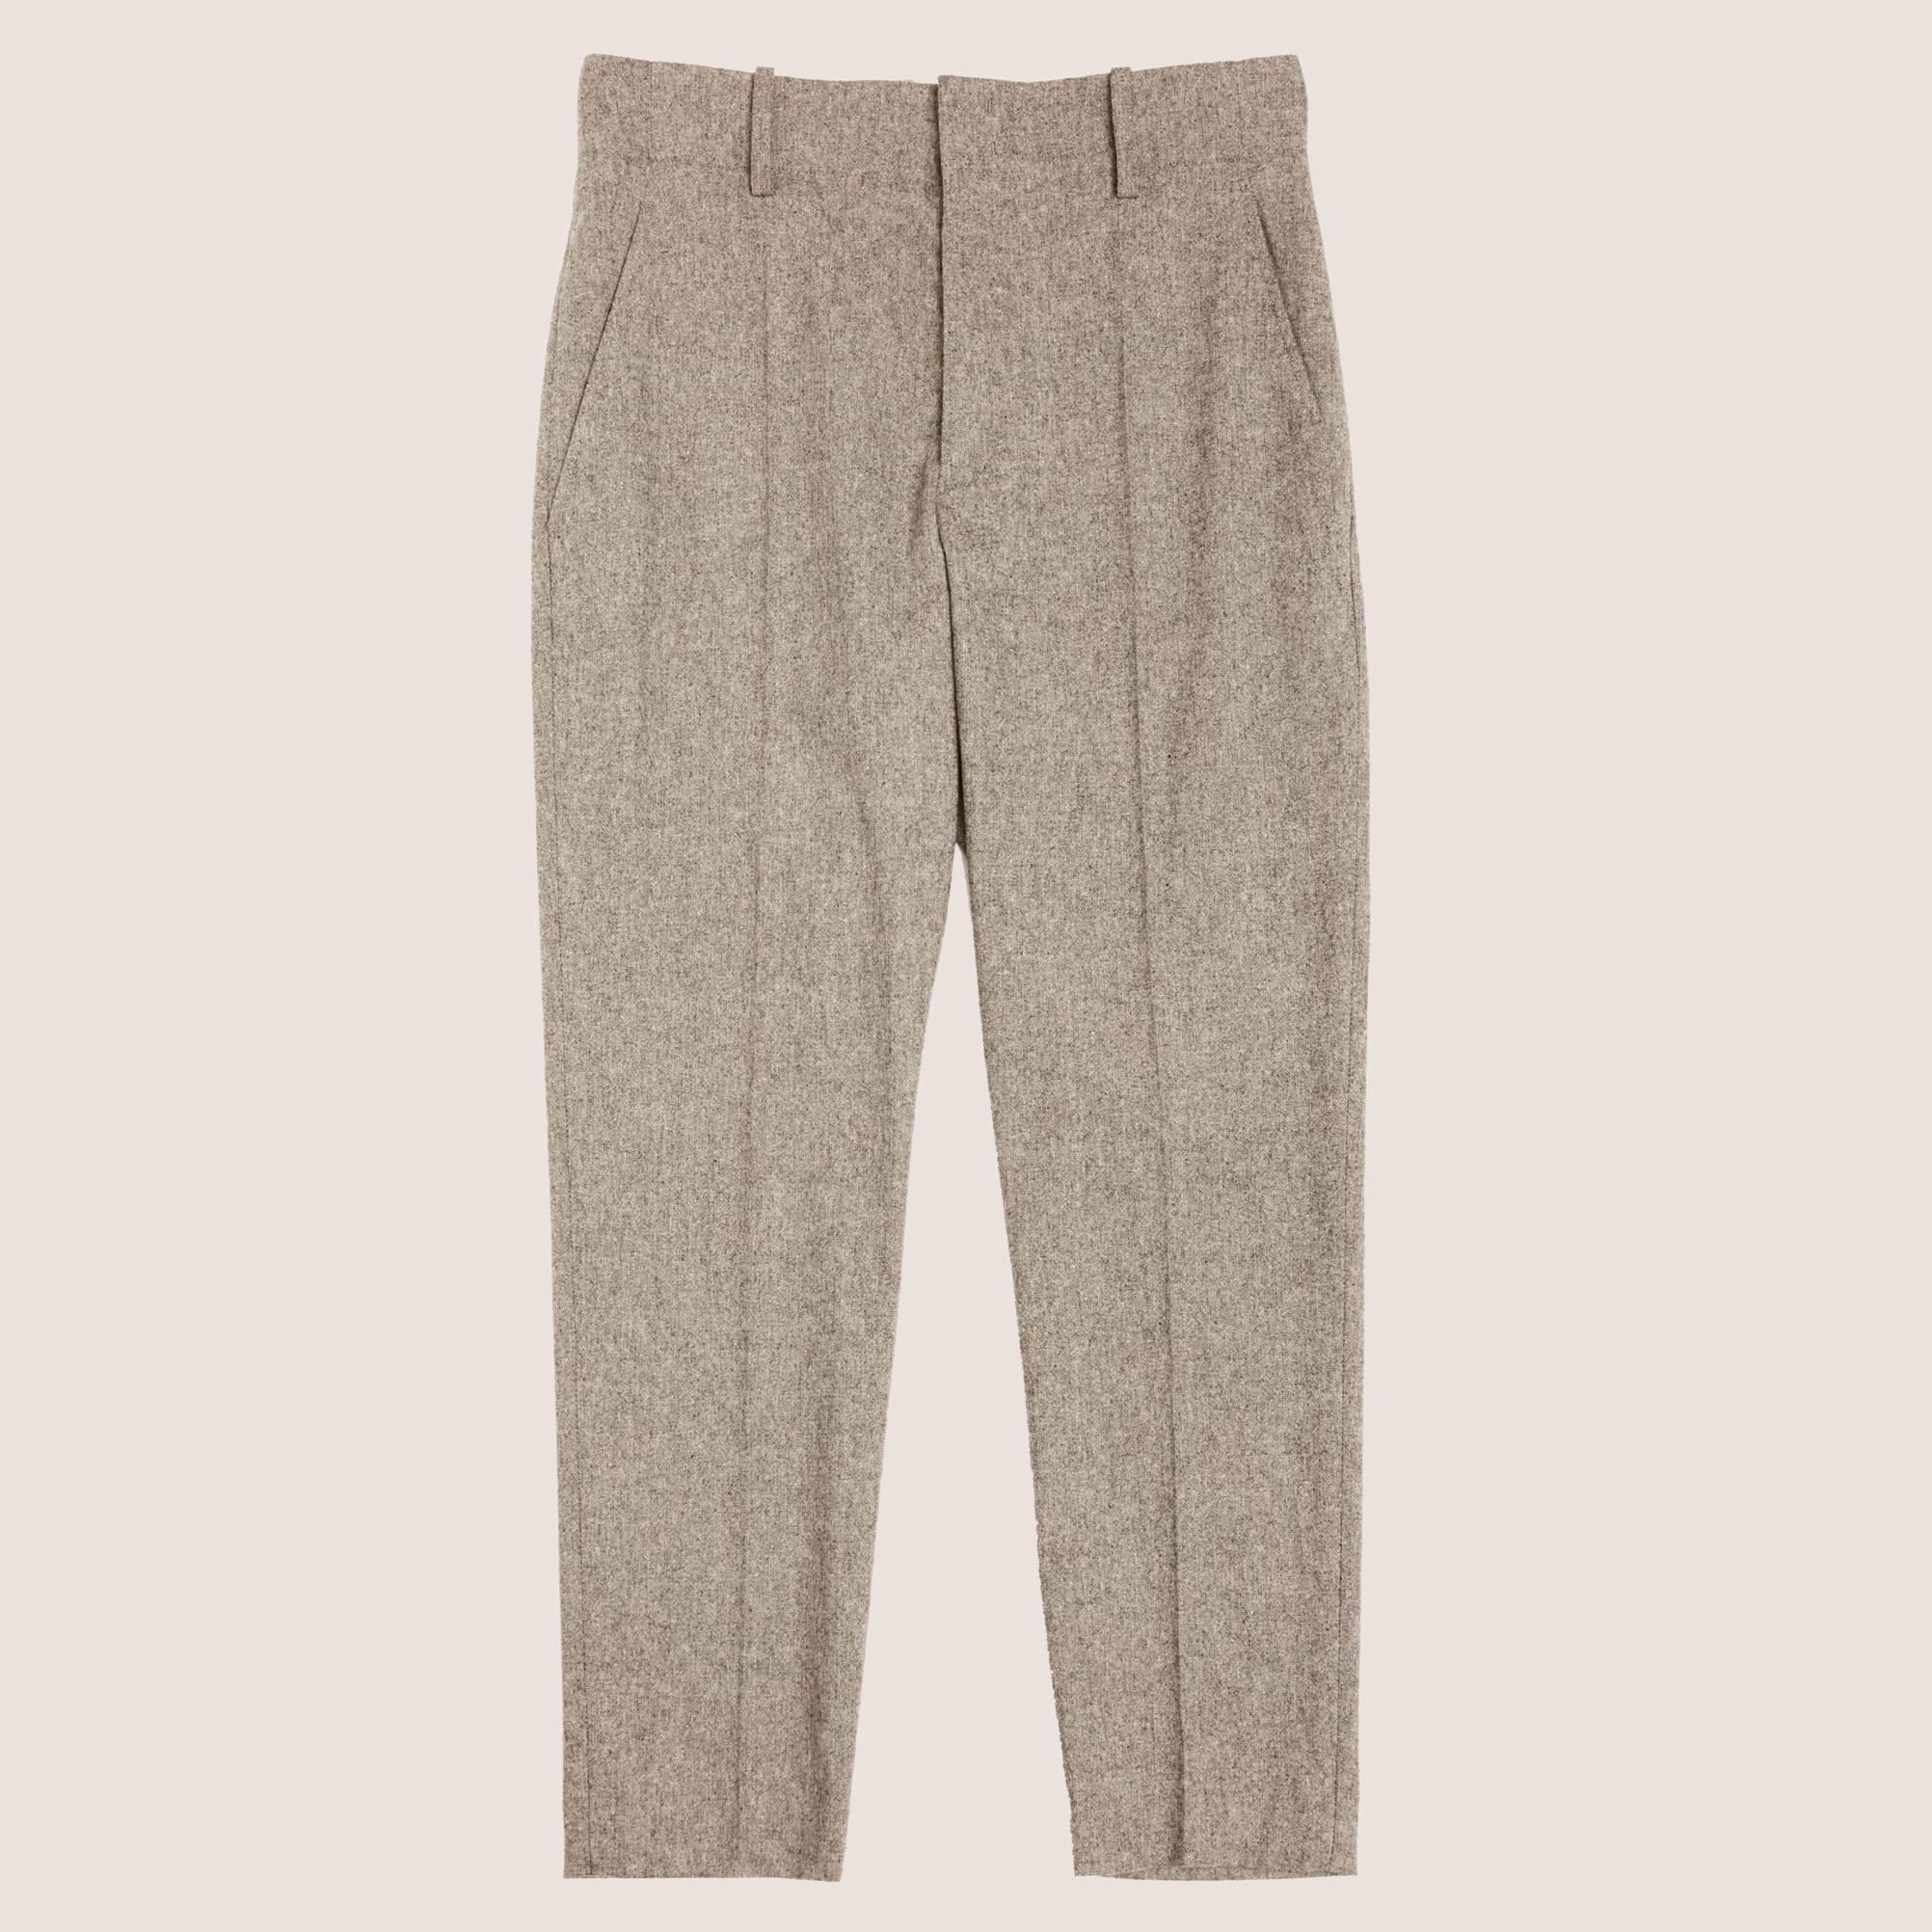 Niloah Pants